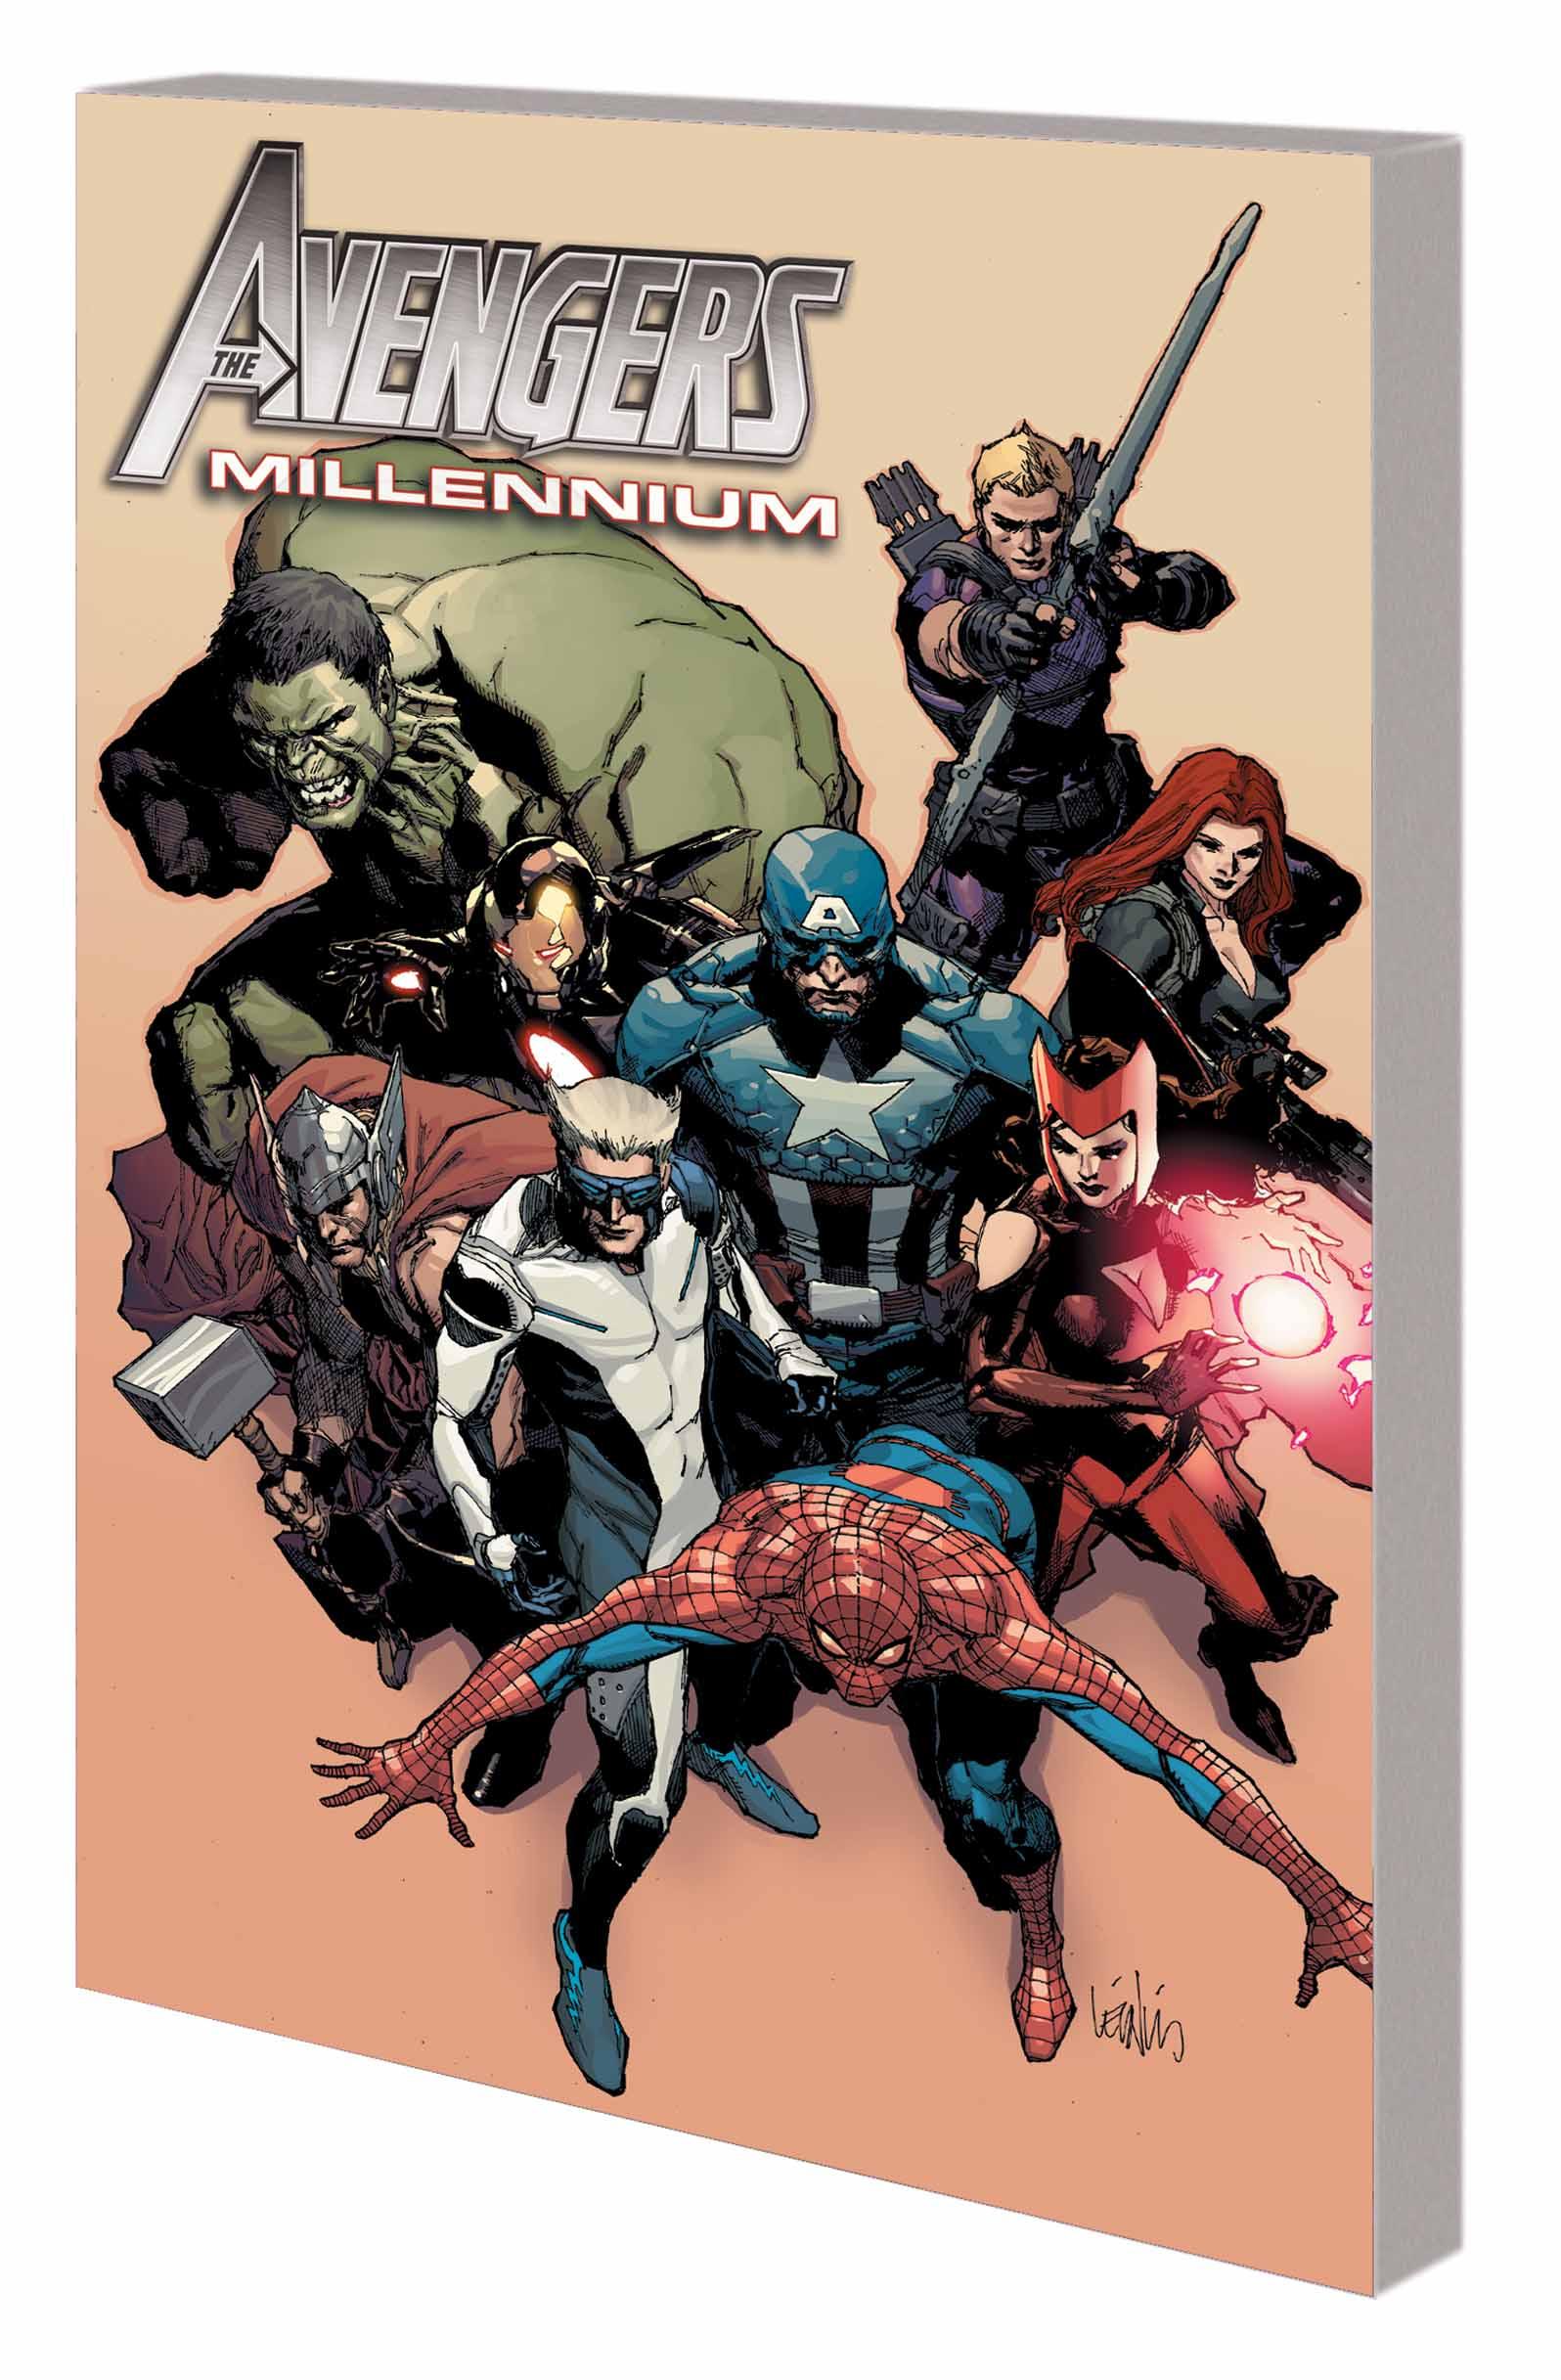 Avengers: Millennium (Trade Paperback)